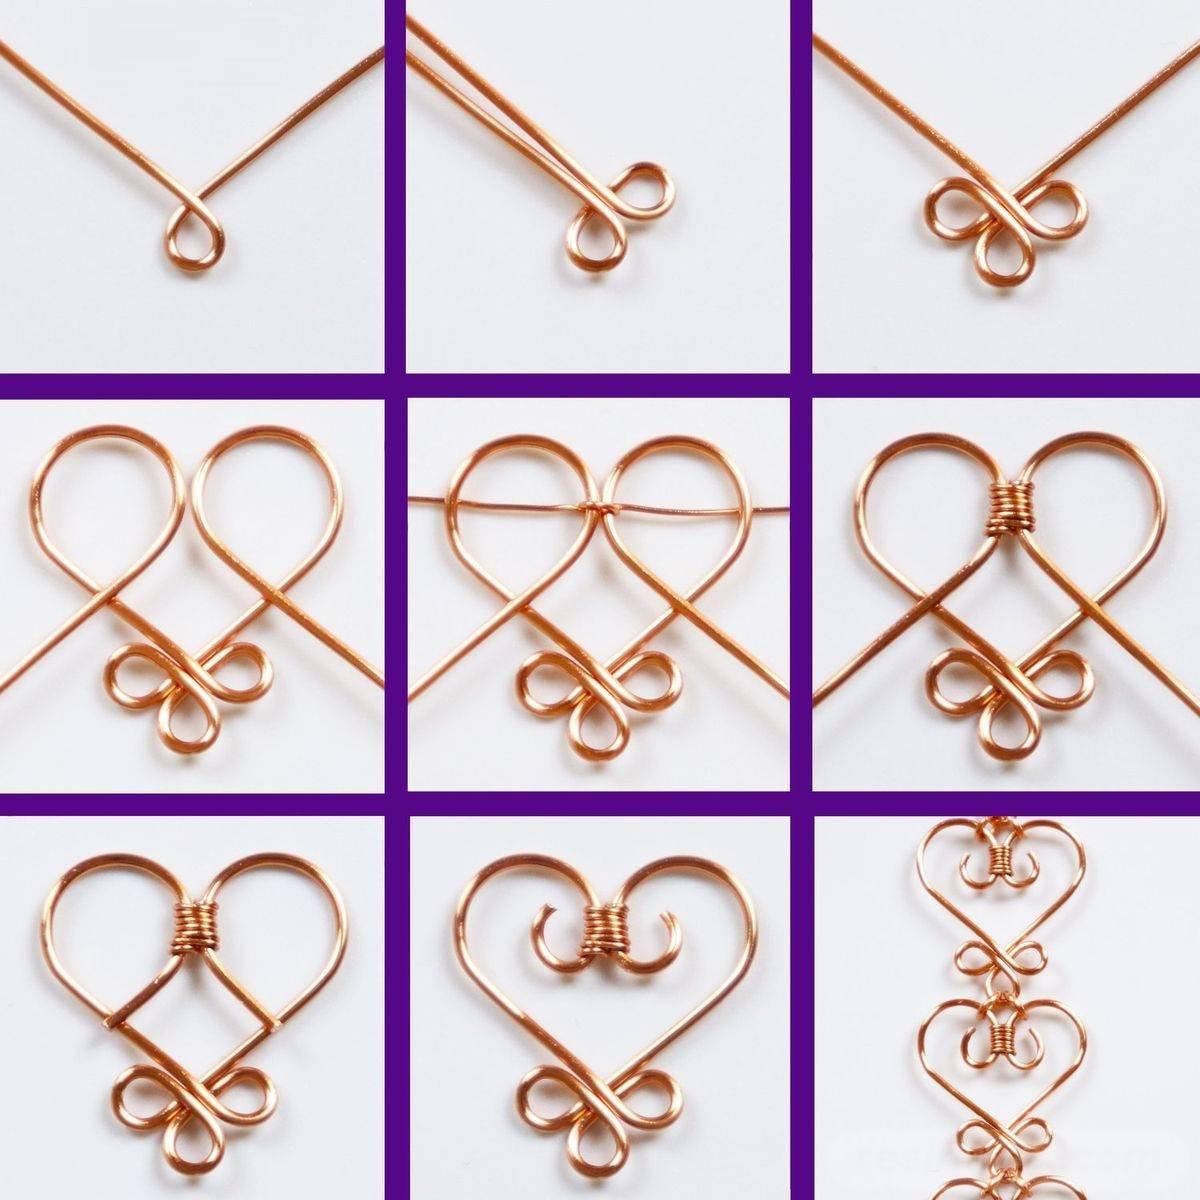 11 Stunning Diy Jewelry Craft Tutorials Homemade Jewelry Ideas